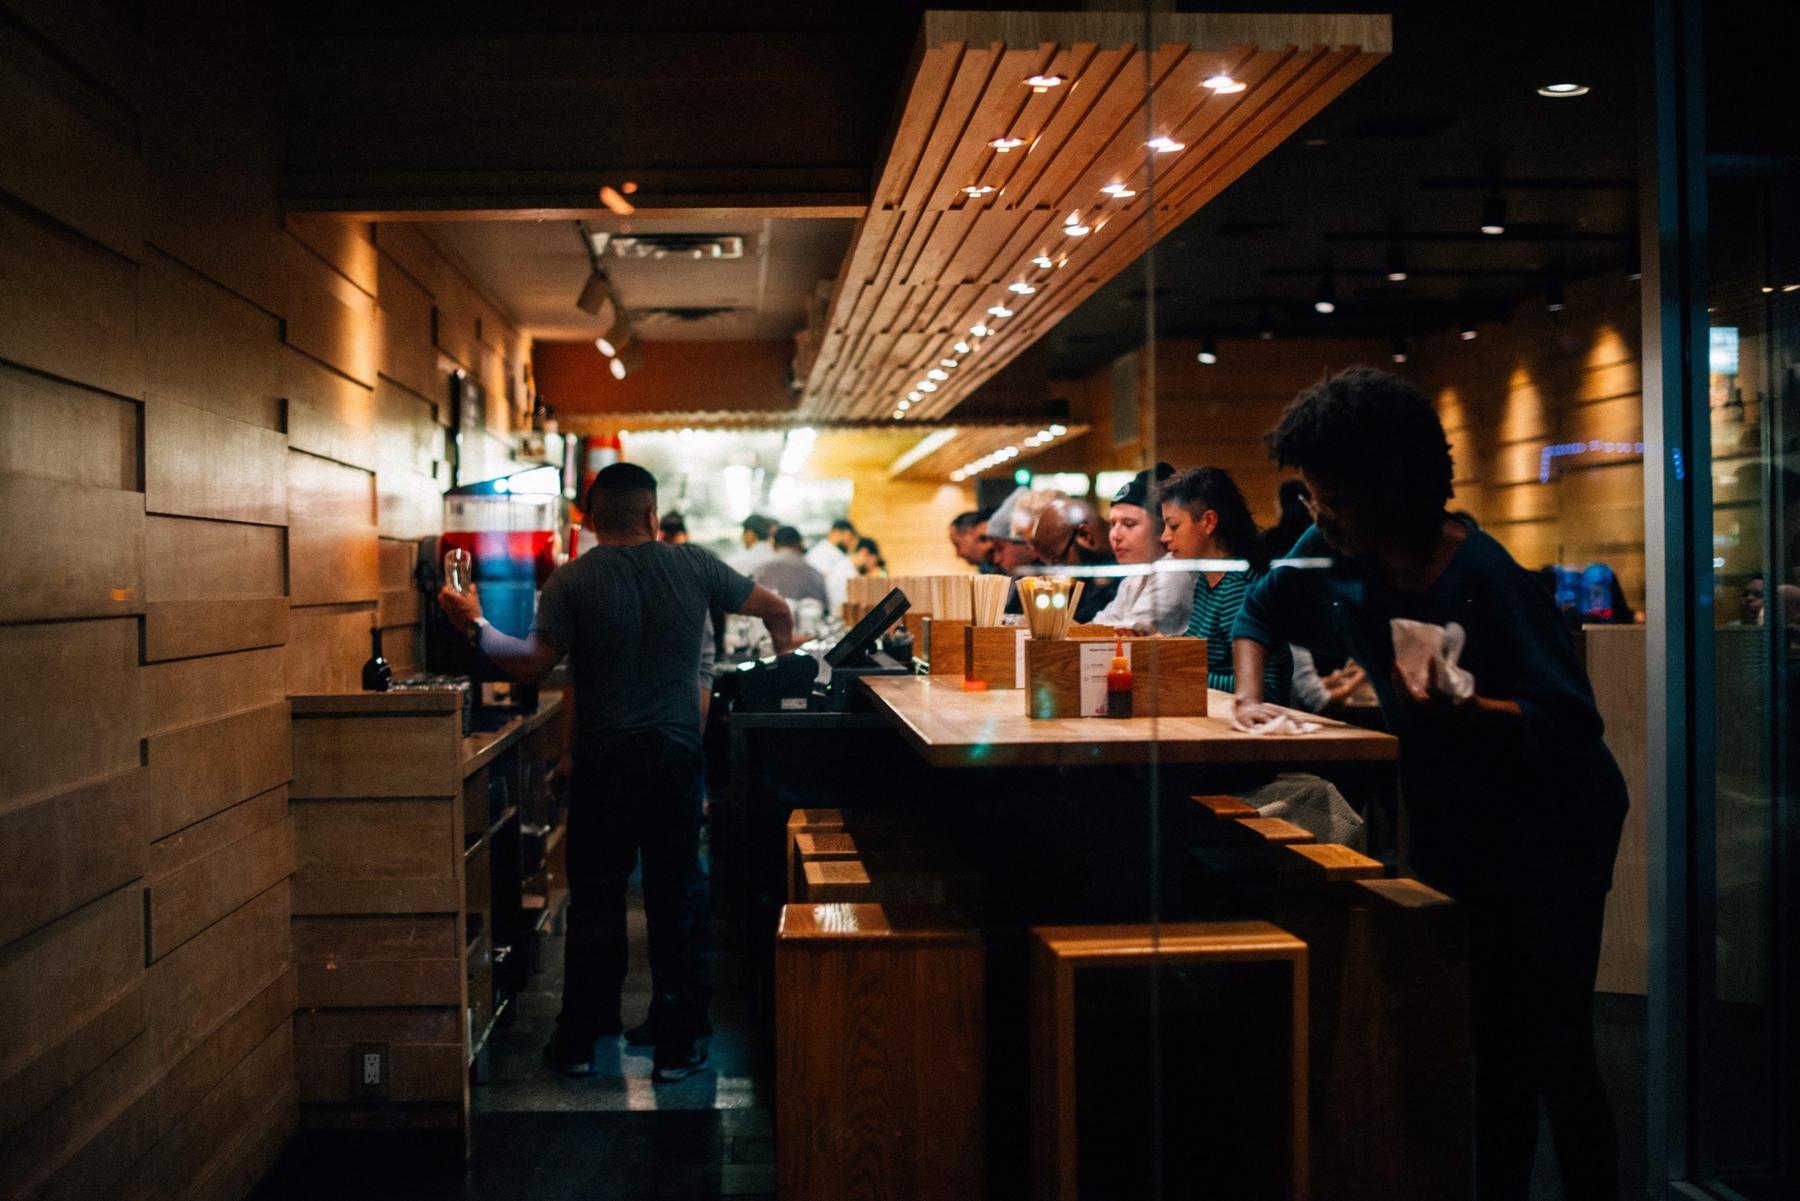 window view of momofuku restaurant in new york city at night